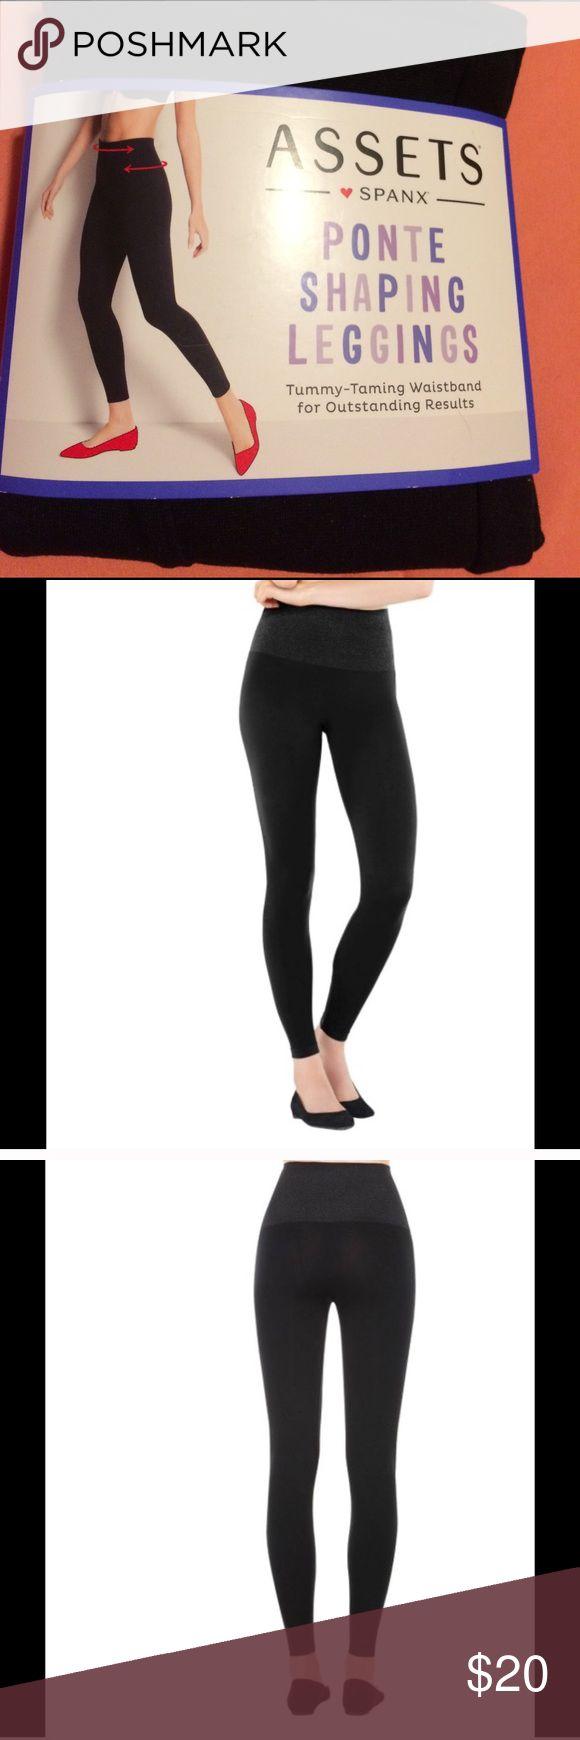 "Assets ❤ Spanx shaping leggings in black sz. large Assets ❤ Spanx pointe shaping leggings in black. Size large. (Waist 33.5""-35.5"" hips 41""-43"") SPANX Intimates & Sleepwear Shapewear"